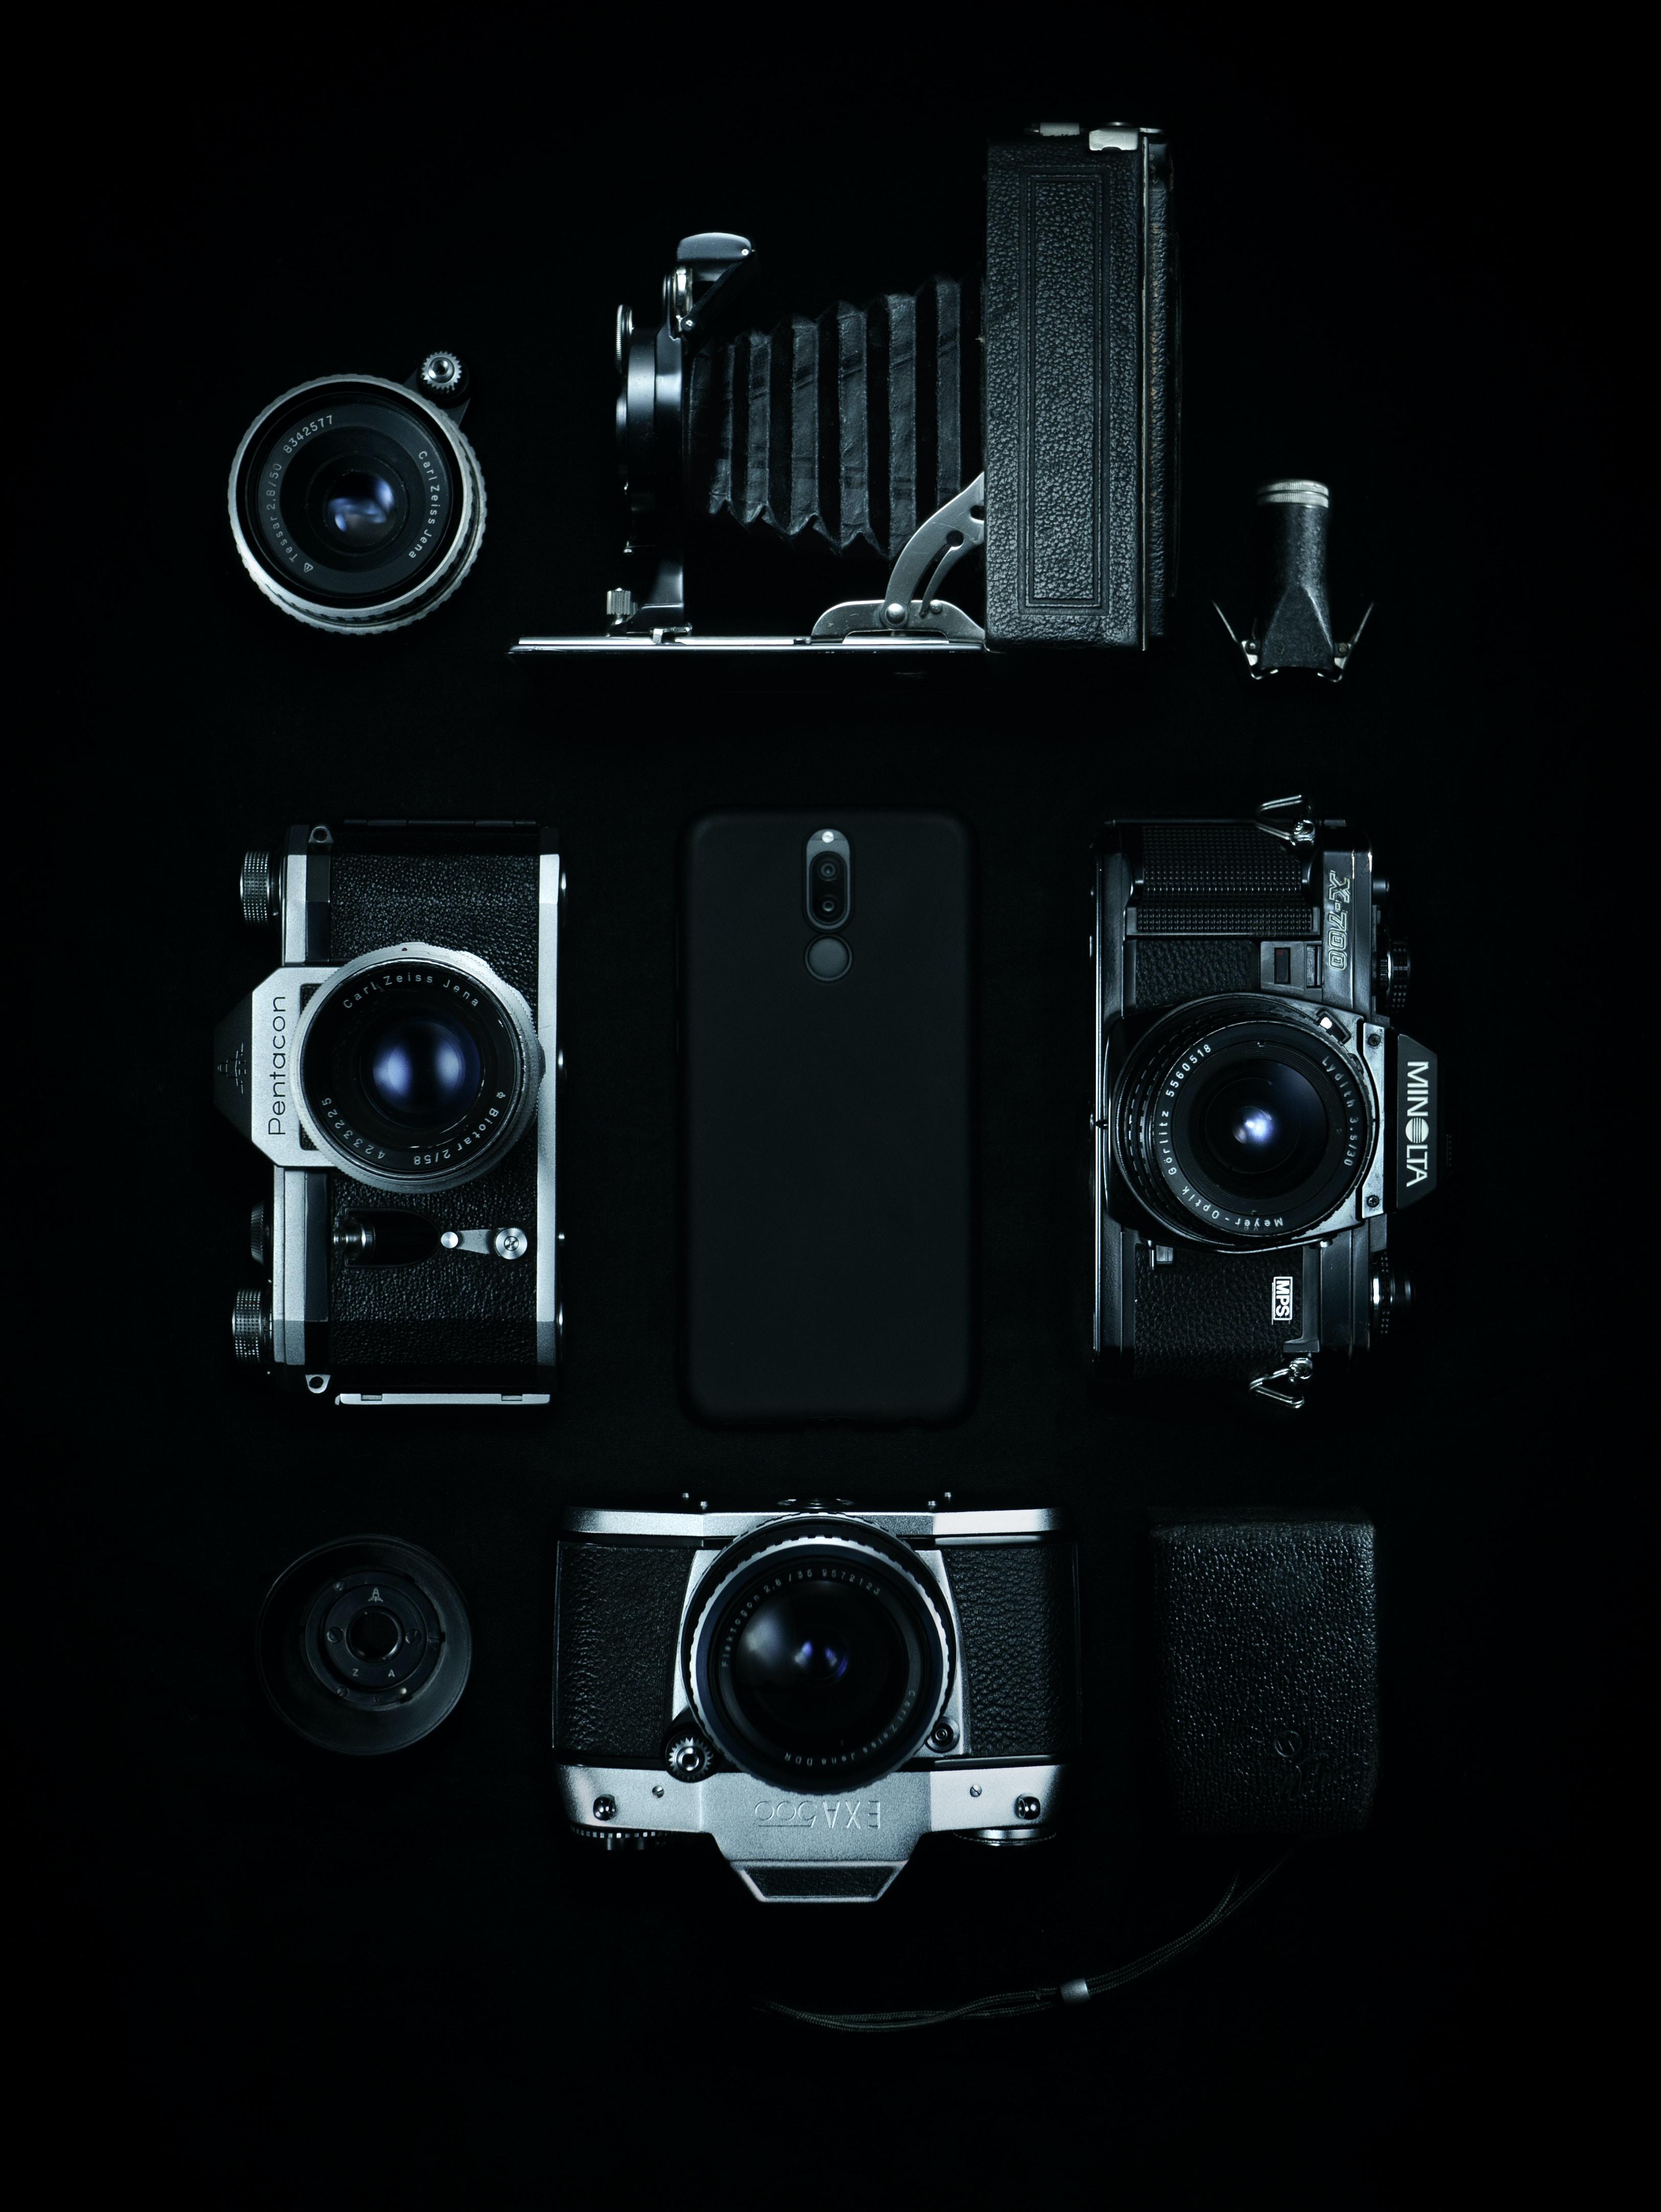 black and gray DSLR camera set